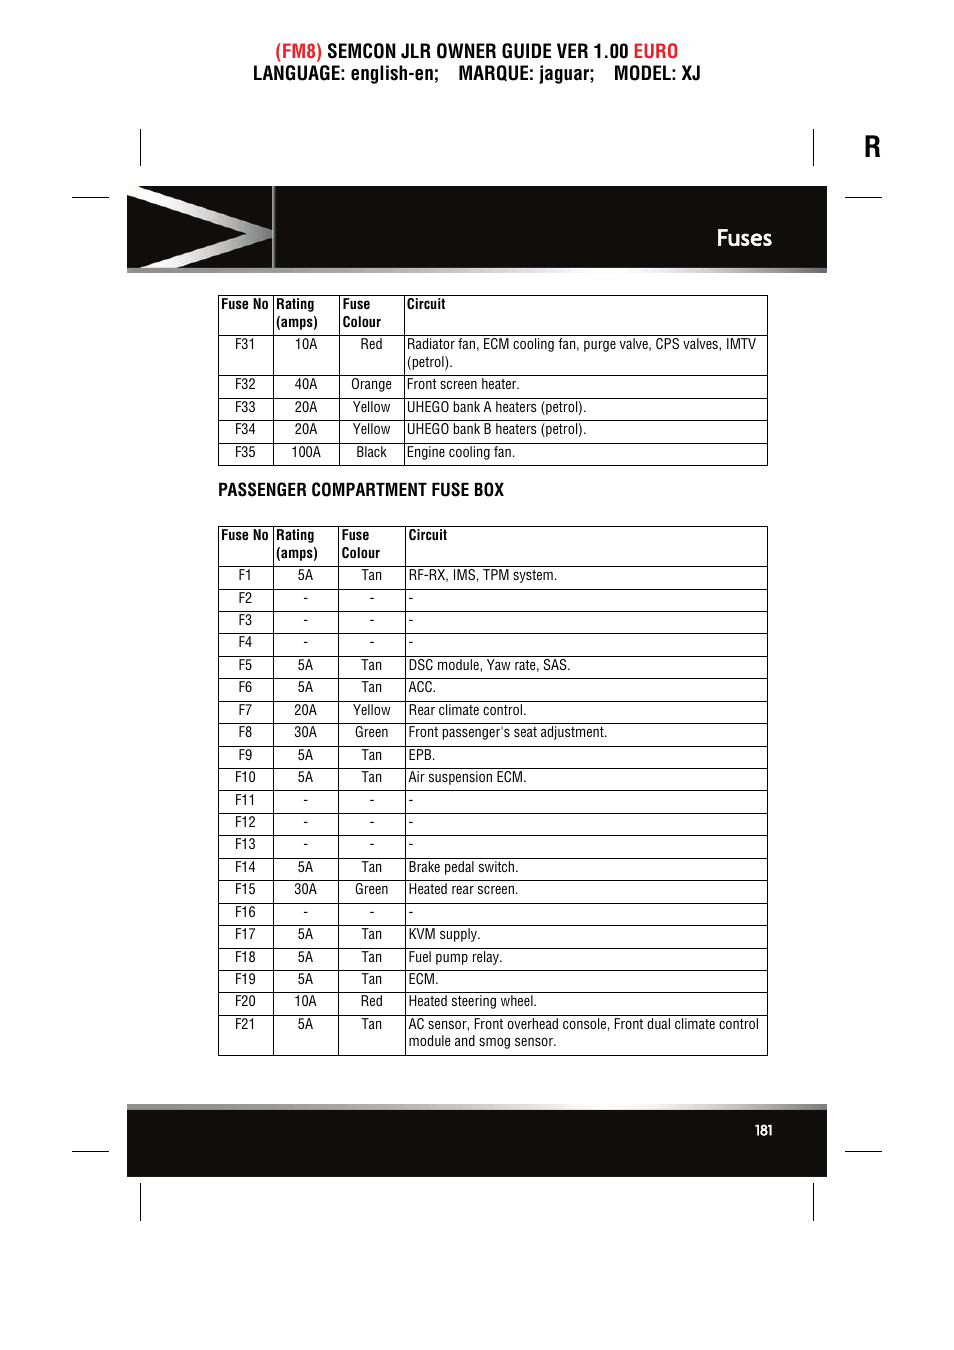 Passenger compartment fuse box, Fuses | Jaguar XJ User Manual | Page 181 /  207